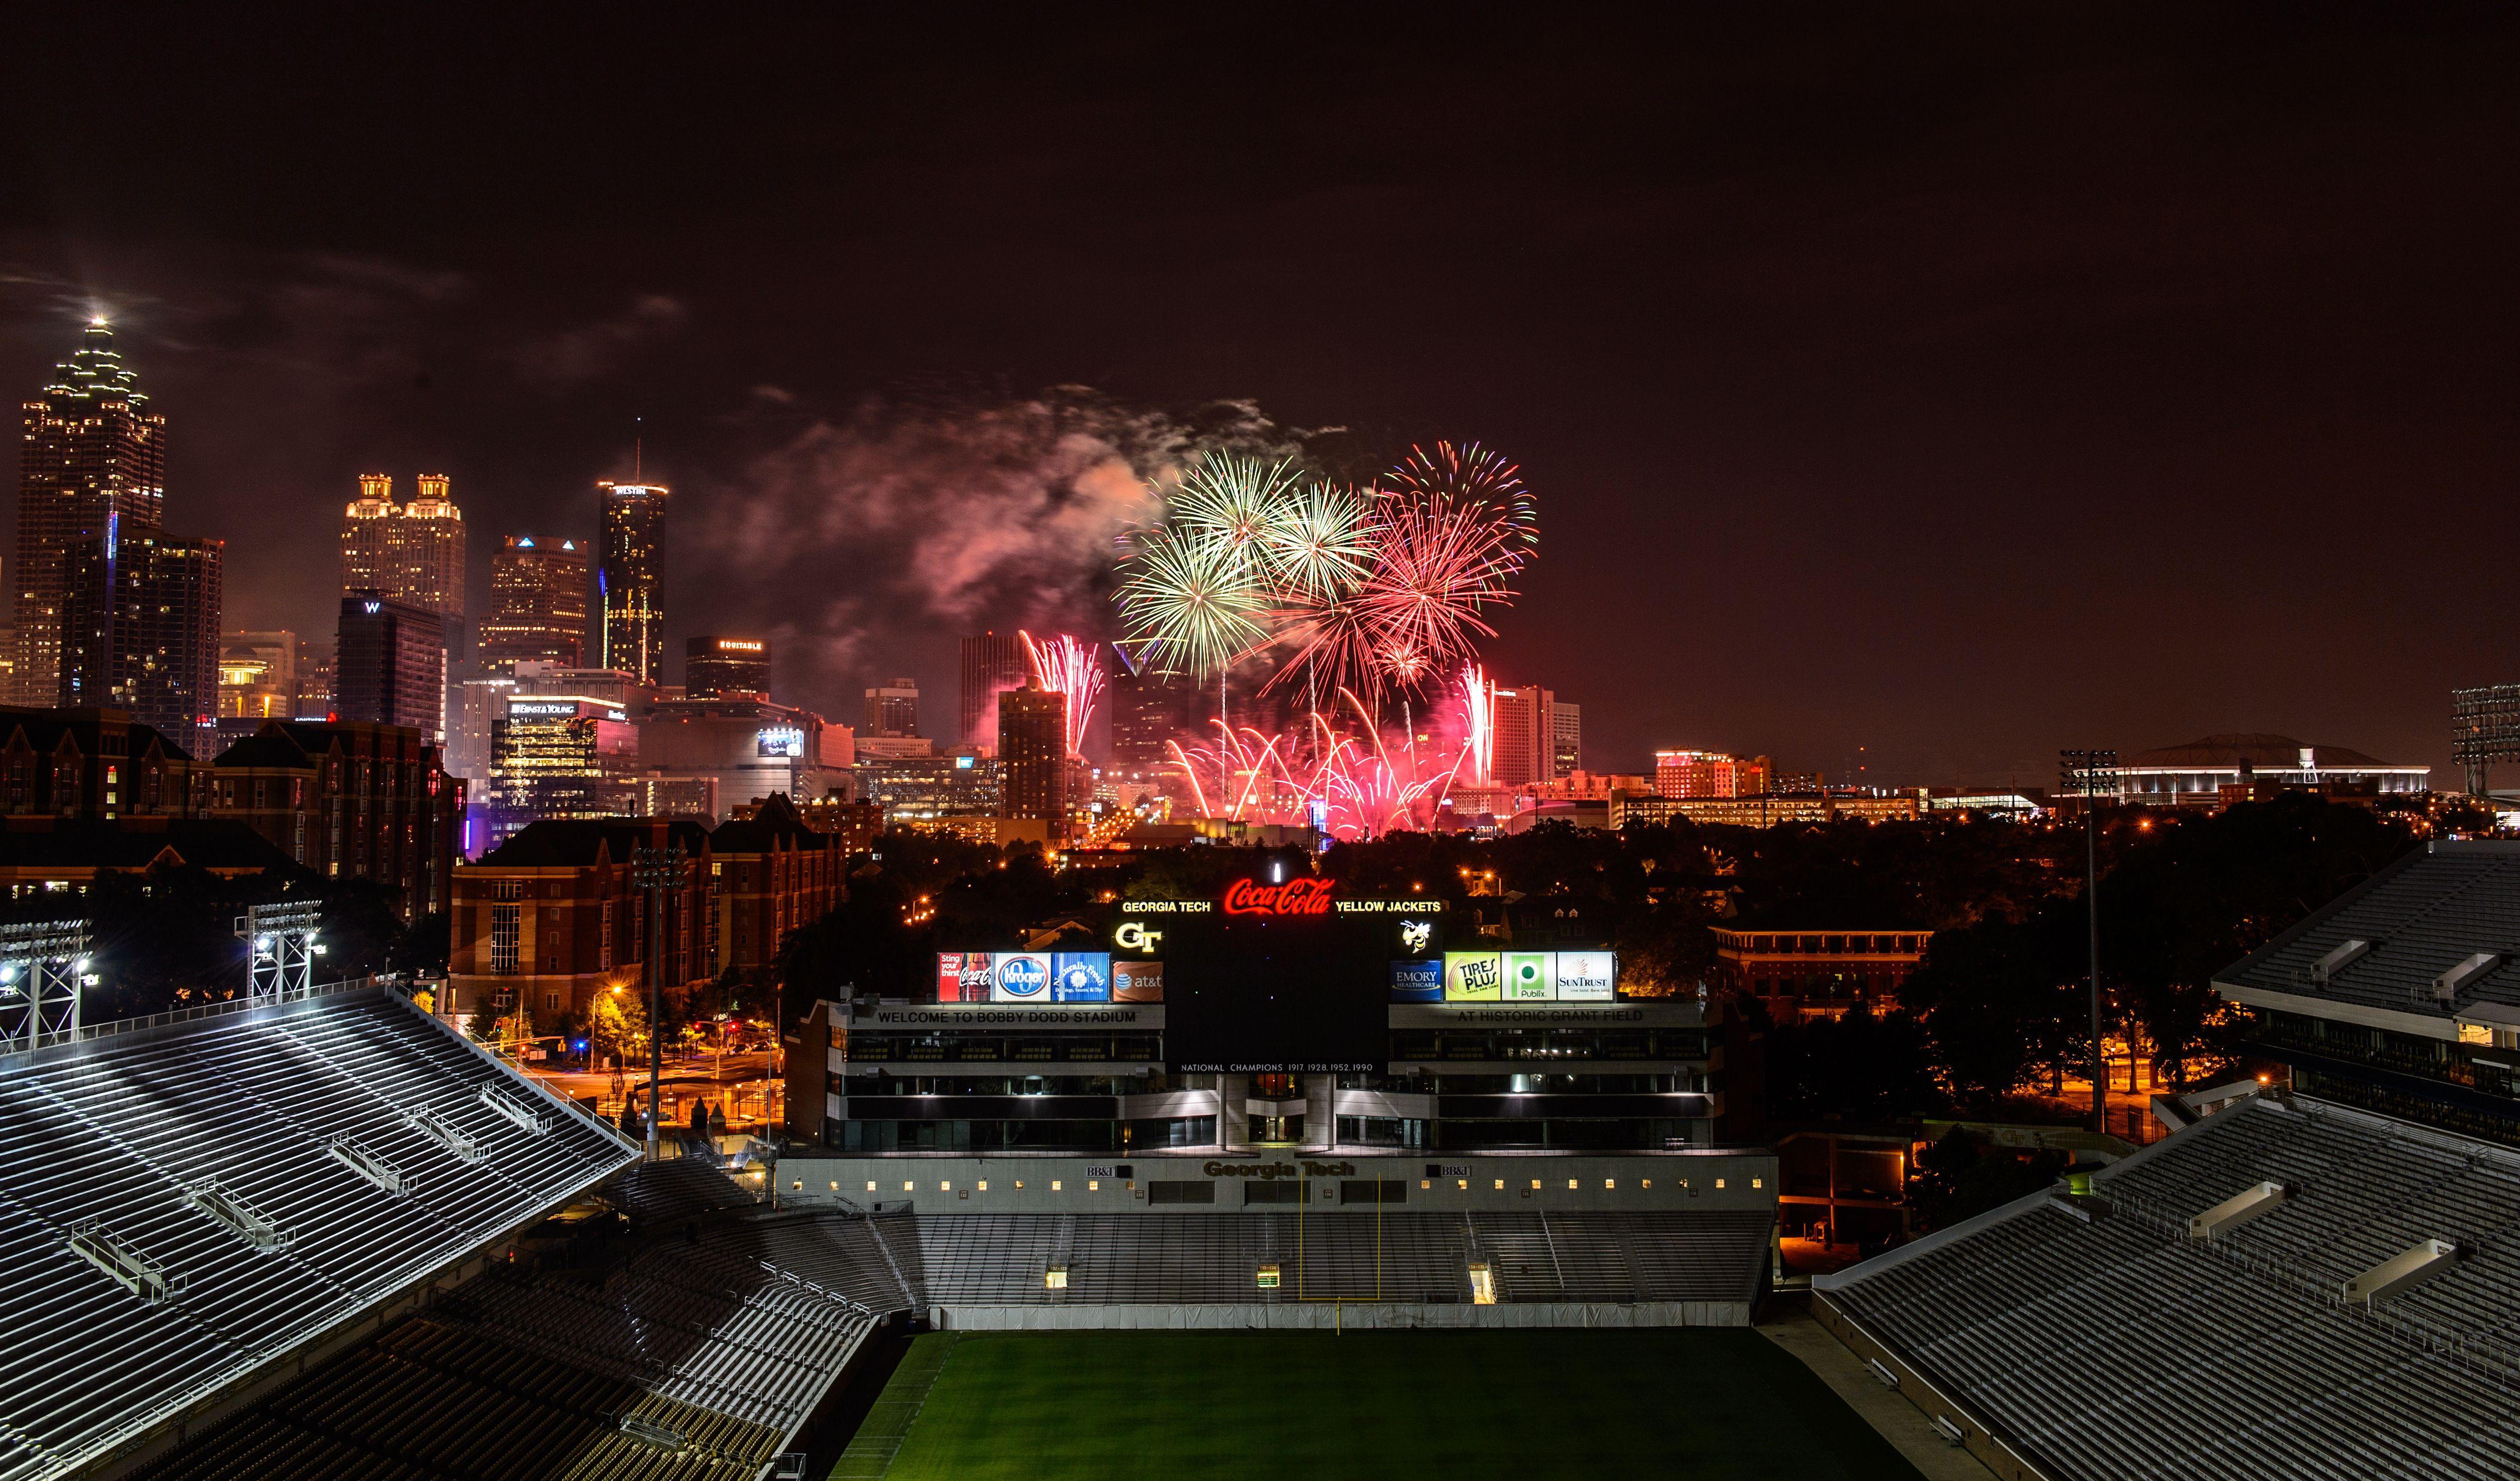 Great Photo Of Downtown Atlanta Fireworks From The Fourth Of July Inside Bobby Dodd Stadium By Danny Kar Georgia Tech Football Georgia Tech Texas Tech Football